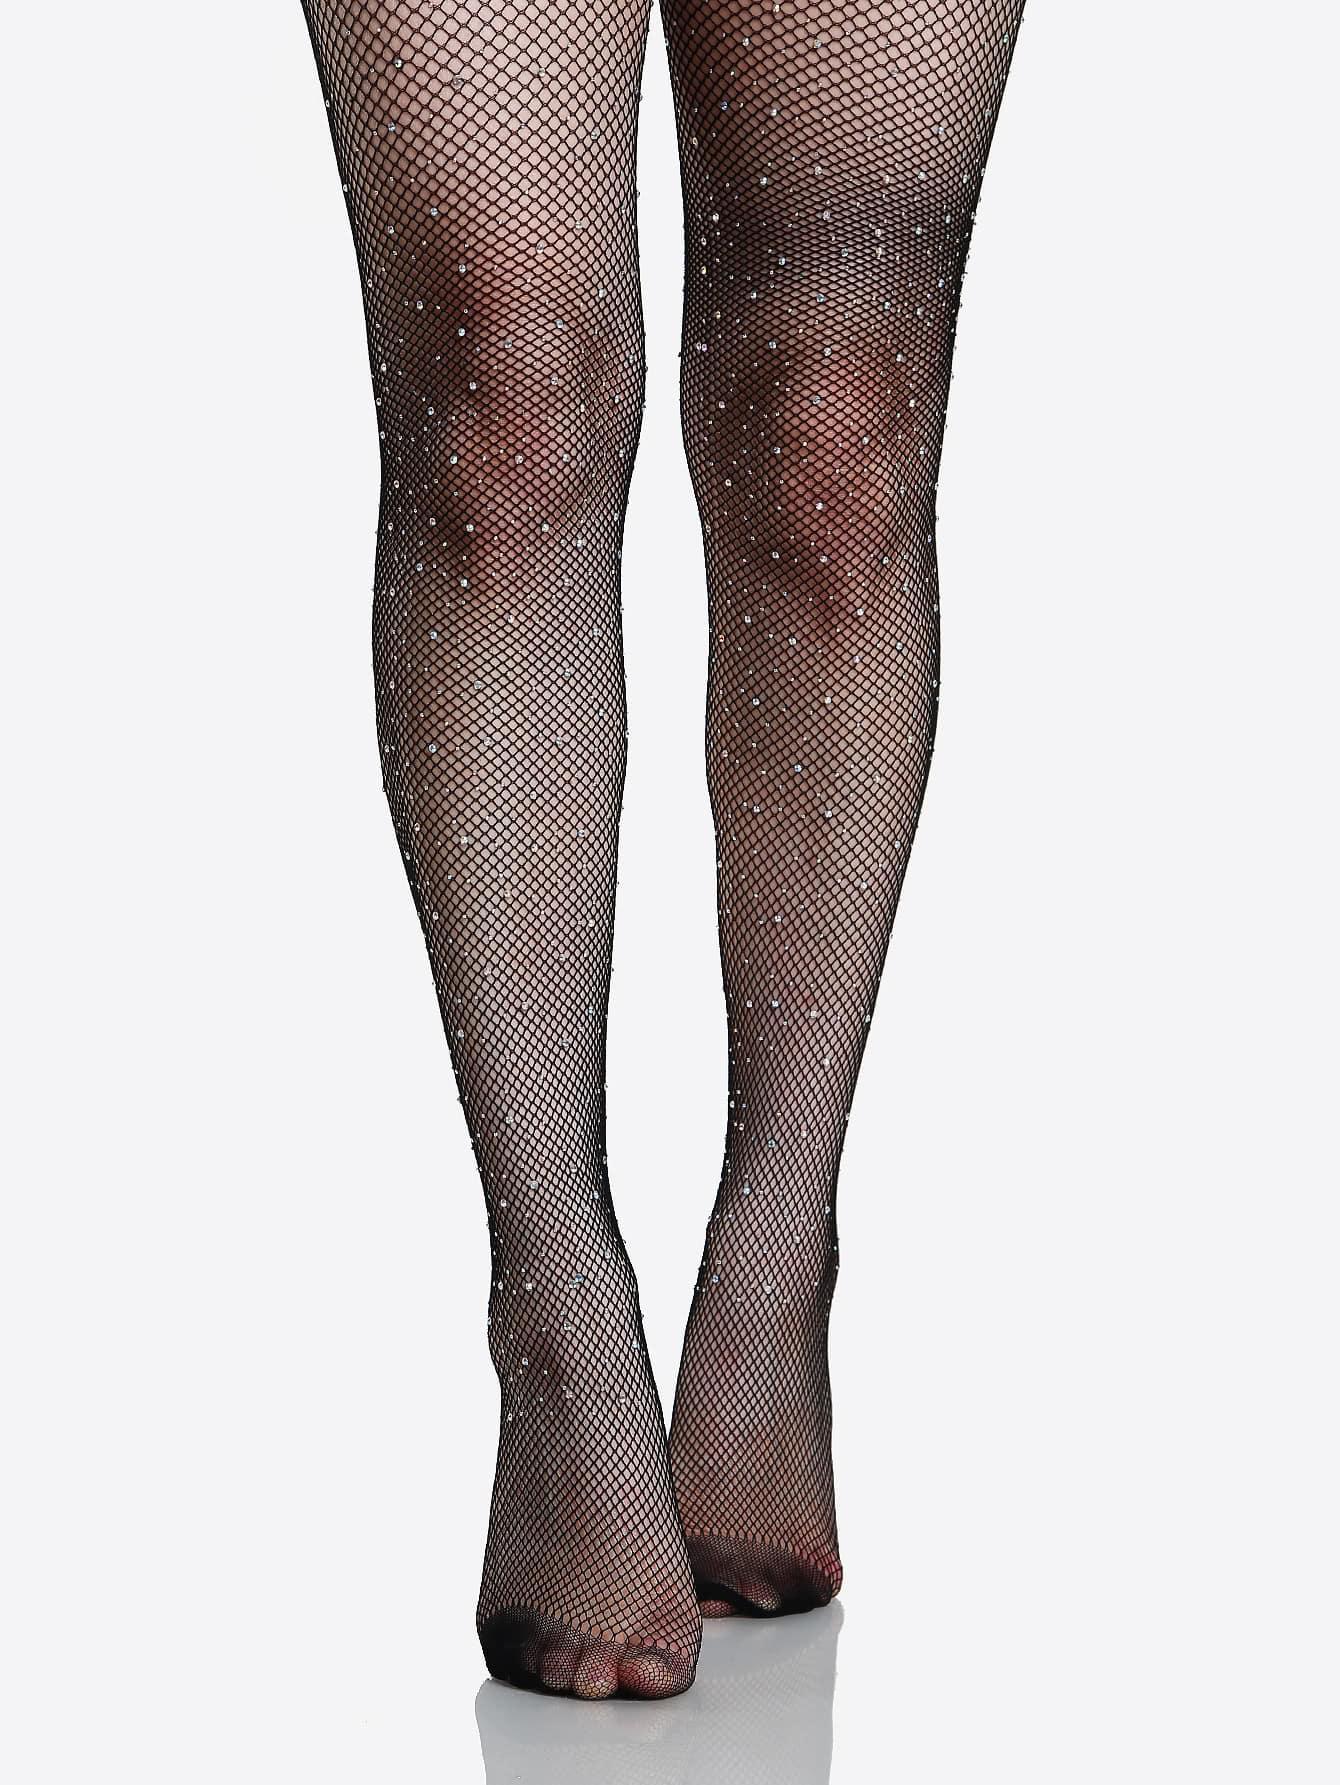 afaad90018bce Diamond Fishnet Stockings BLACK | SHEIN